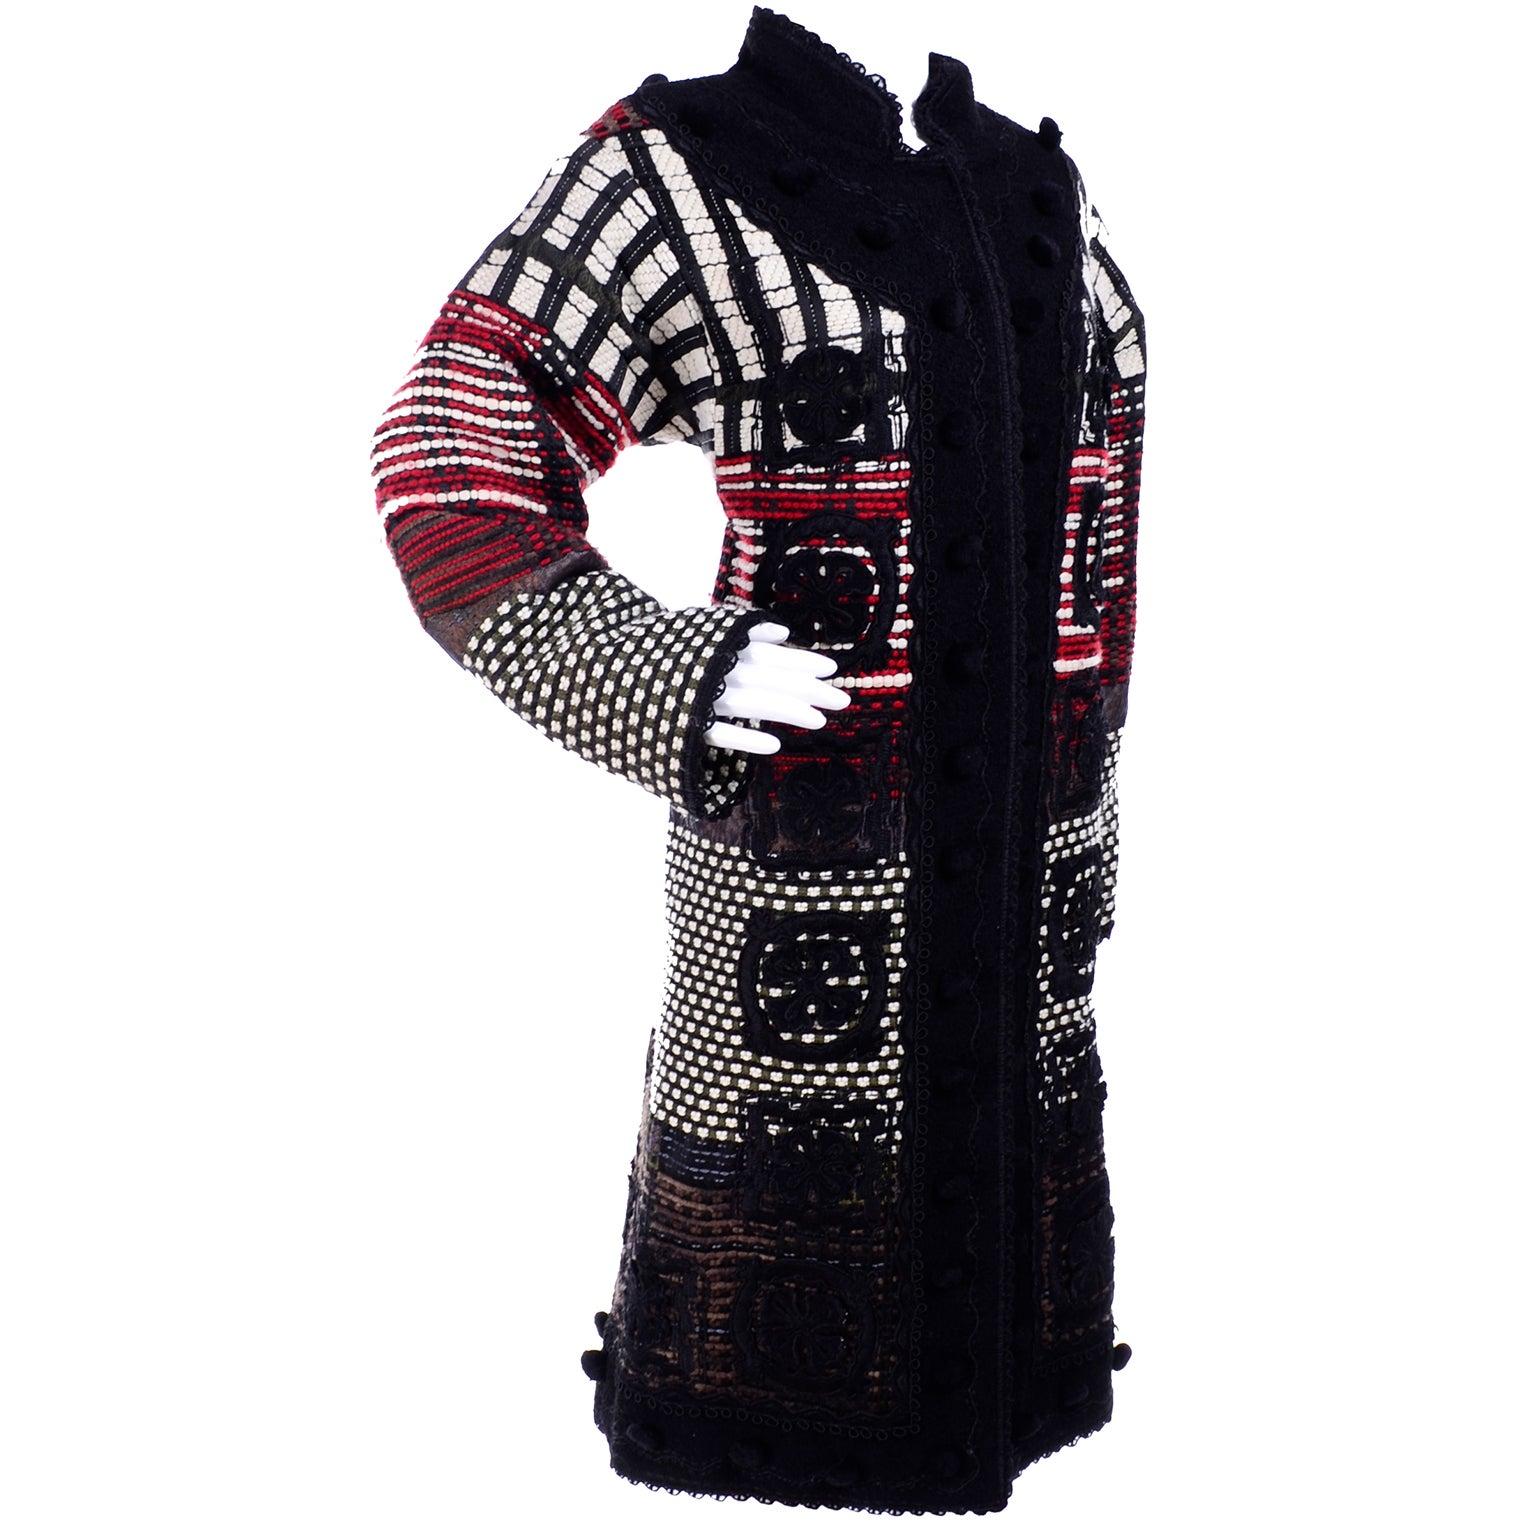 2011 Oscar de la Renta Vintage Mixed Pattern Red & Black Wool Coat with Pom Poms